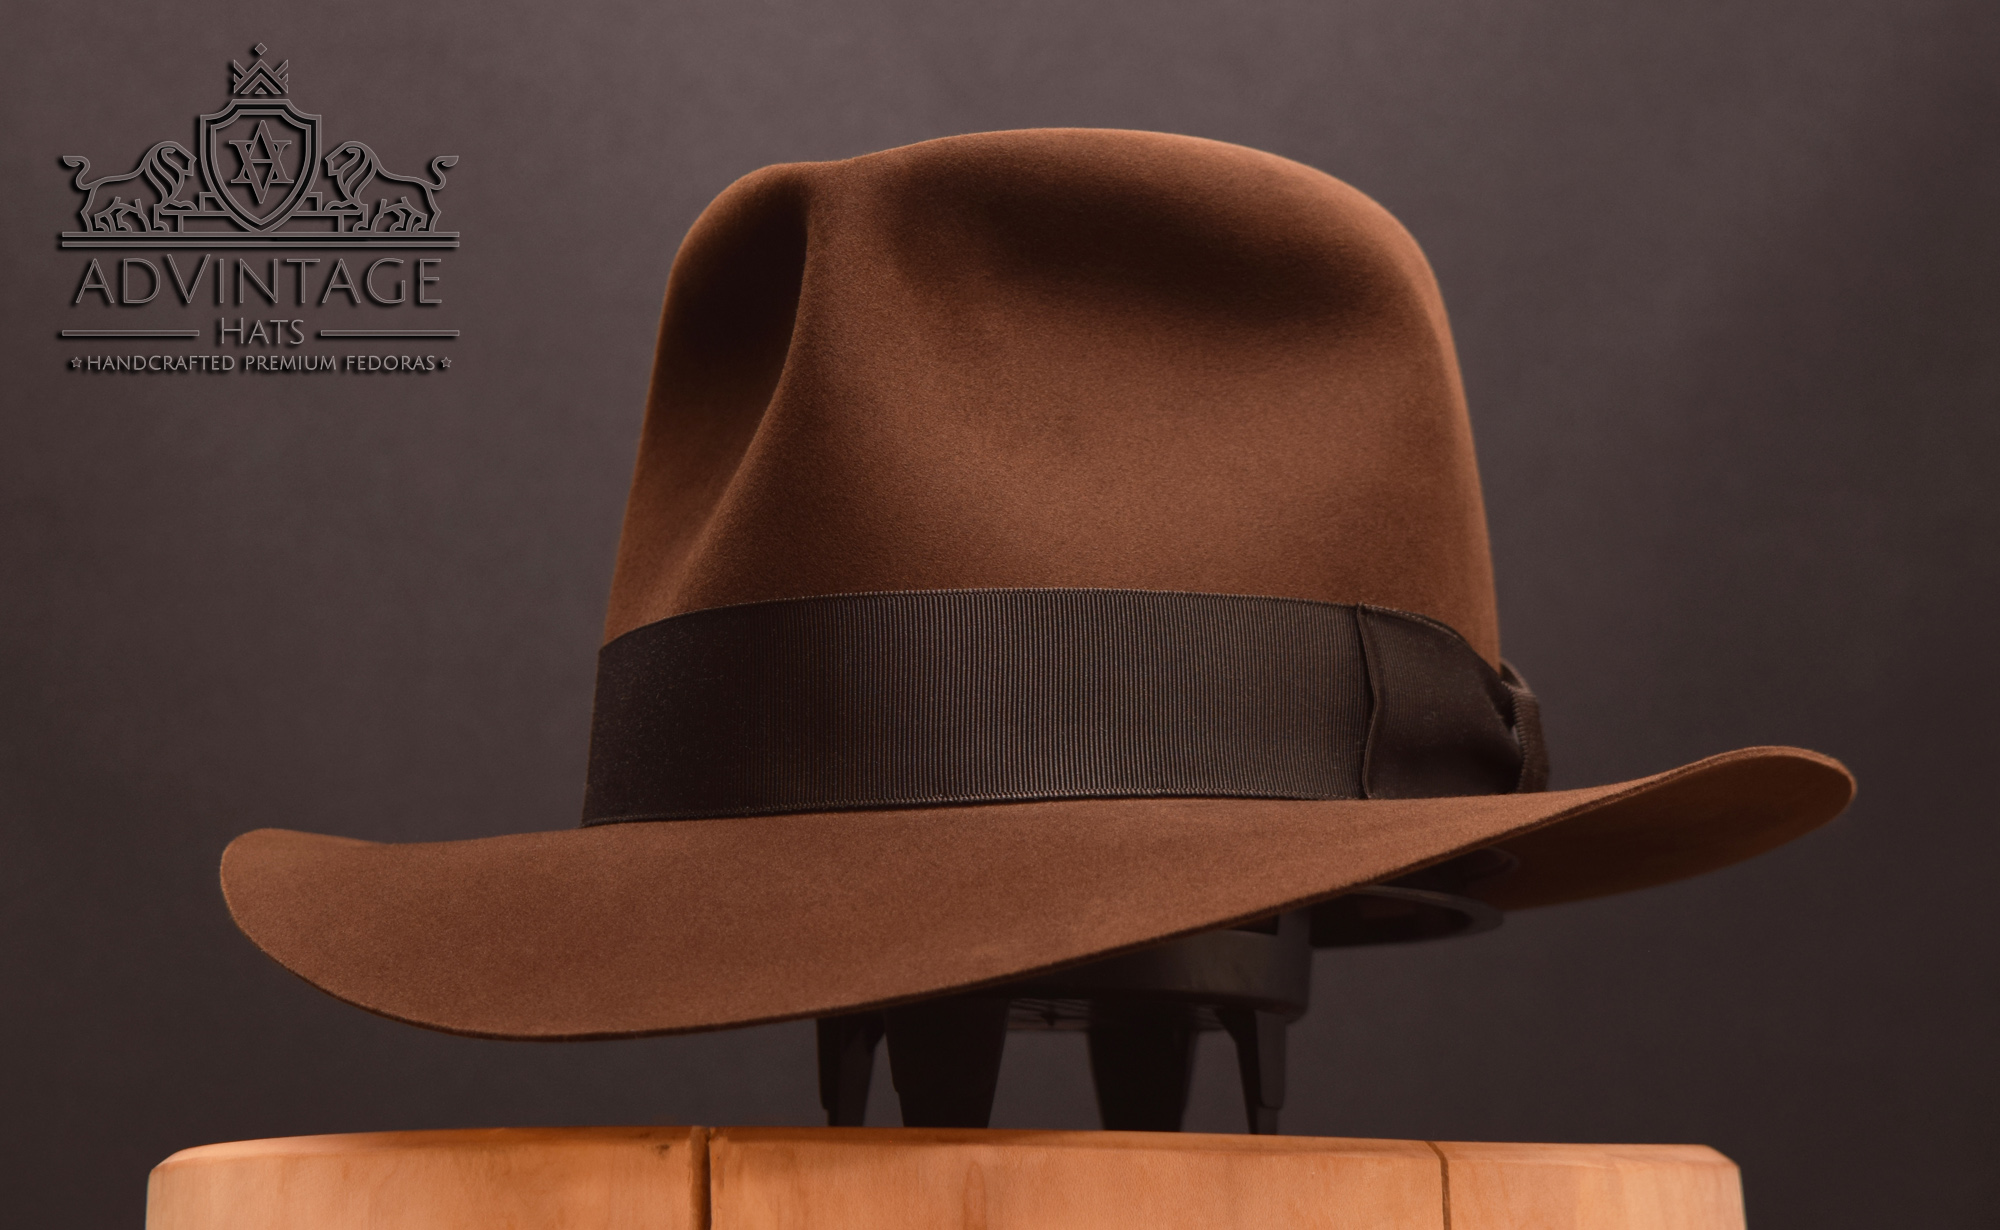 Last Crusade Indiana Jones Fedora hat hut advintage masterpiece true sable